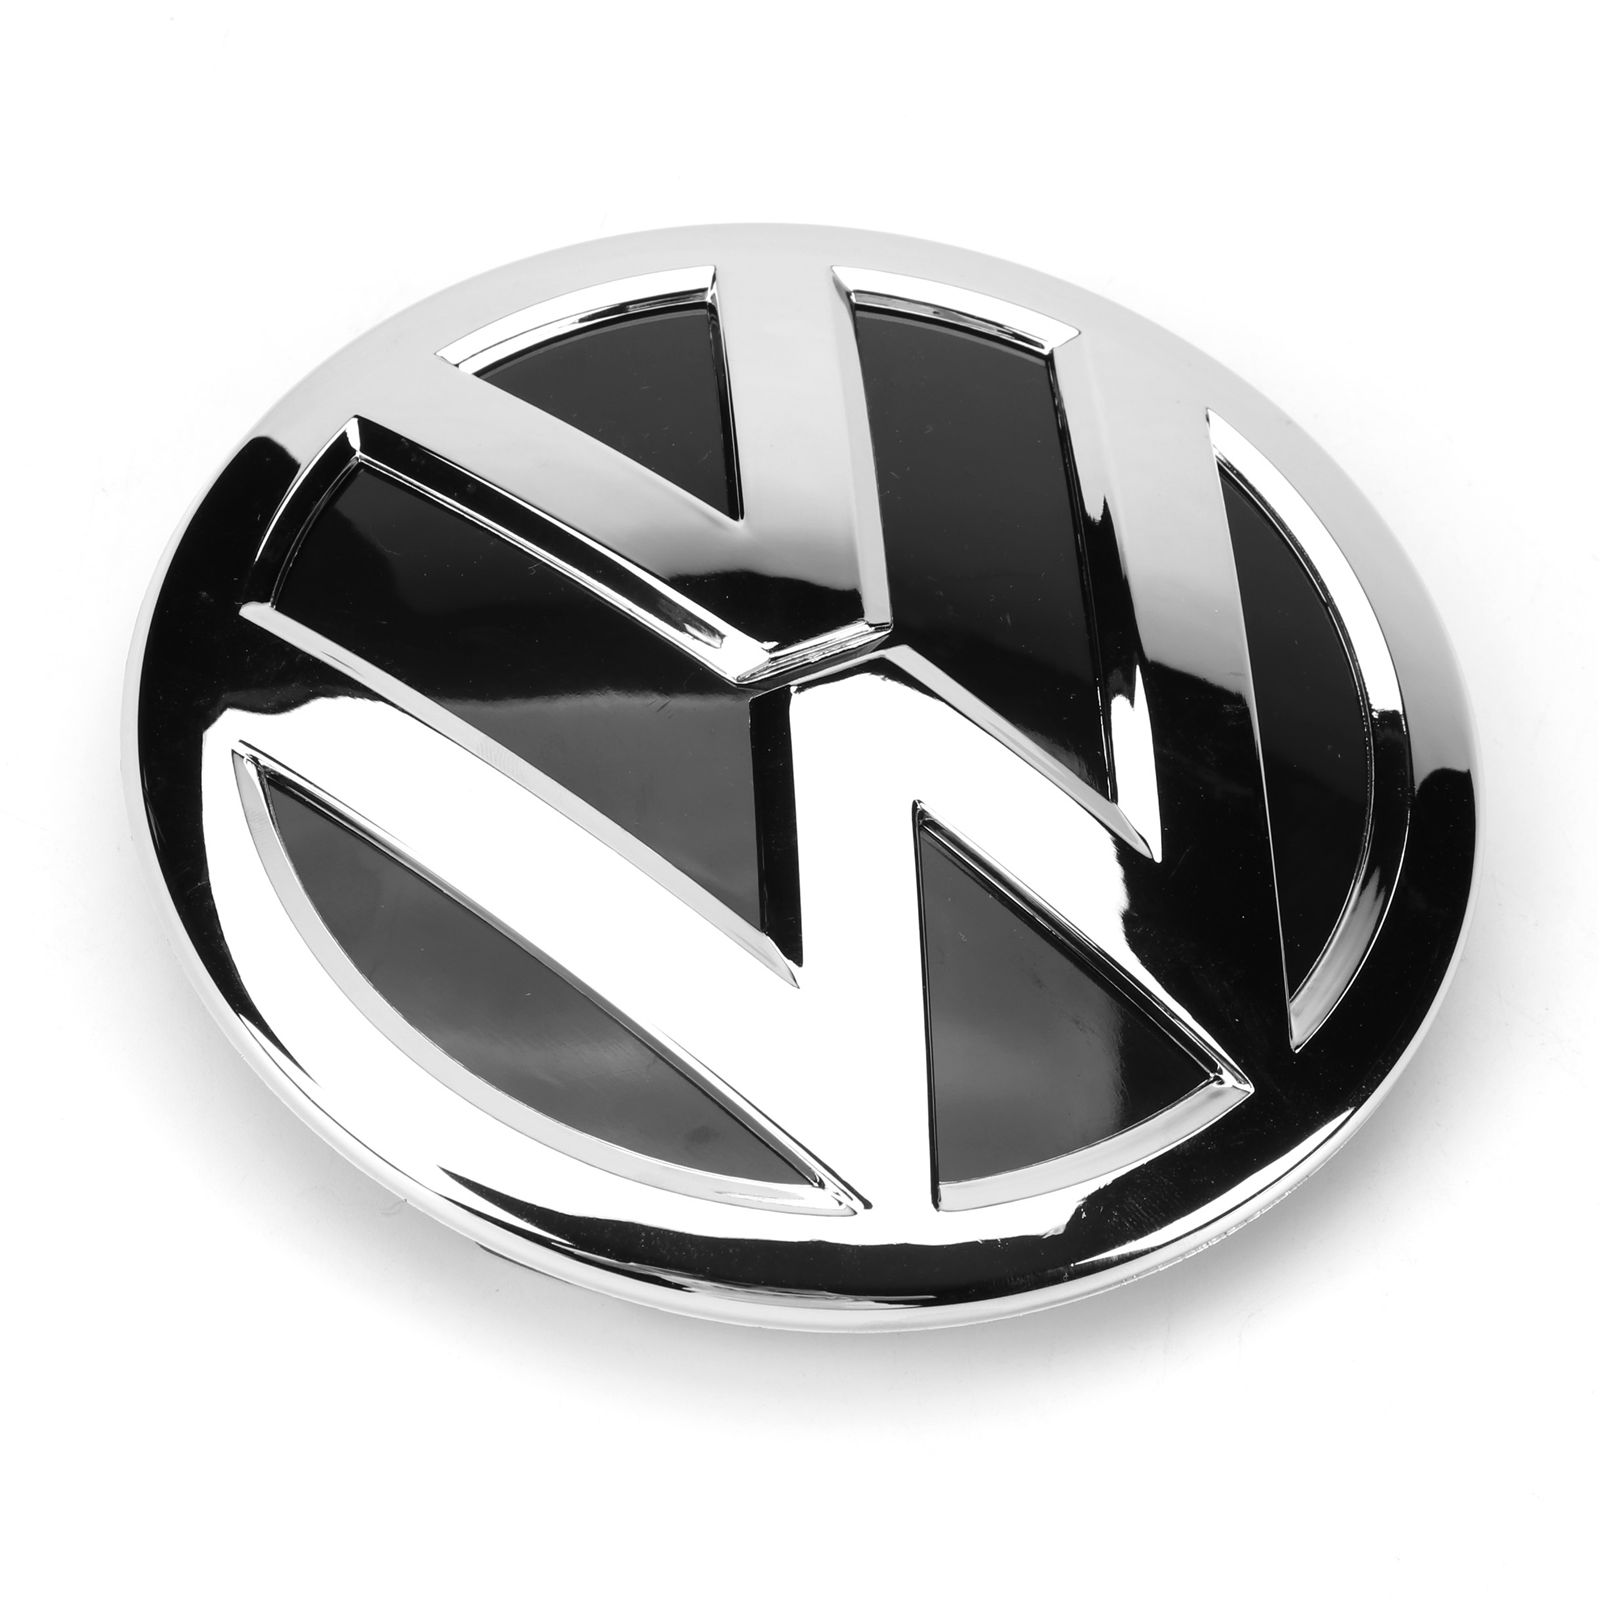 OEM 150 мм Хромированная передняя решетка радиатора, эмблема с автоматическим логотипом для VW Volkswagen CC 35D 853 601